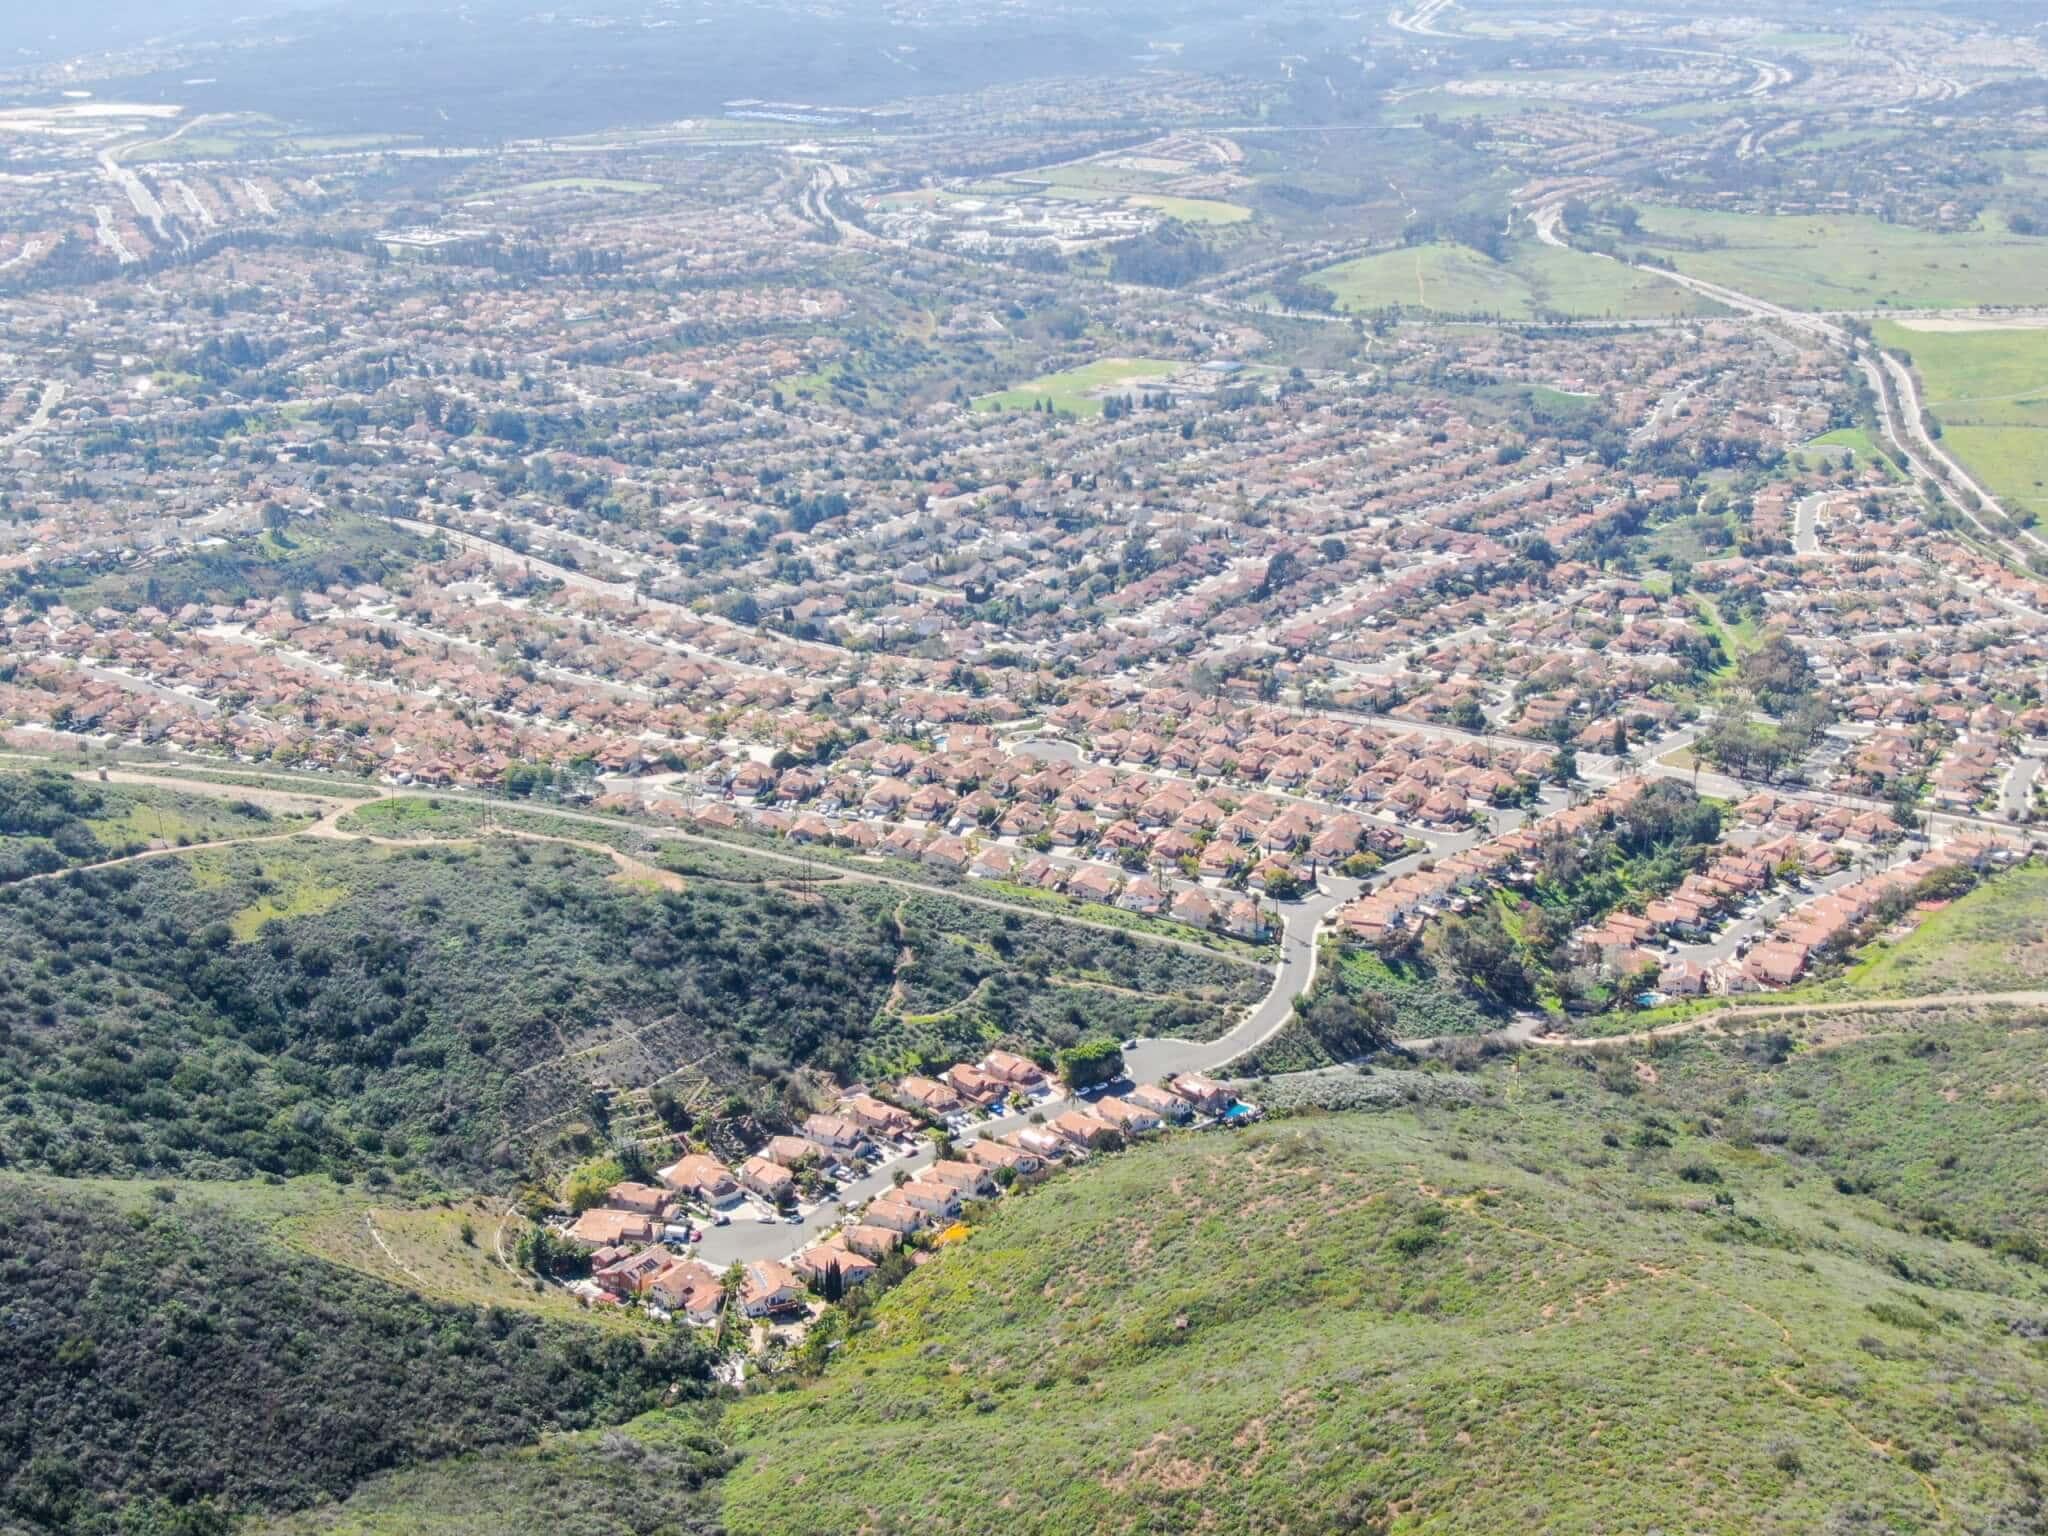 Landscape image of Carmel Valley, CA